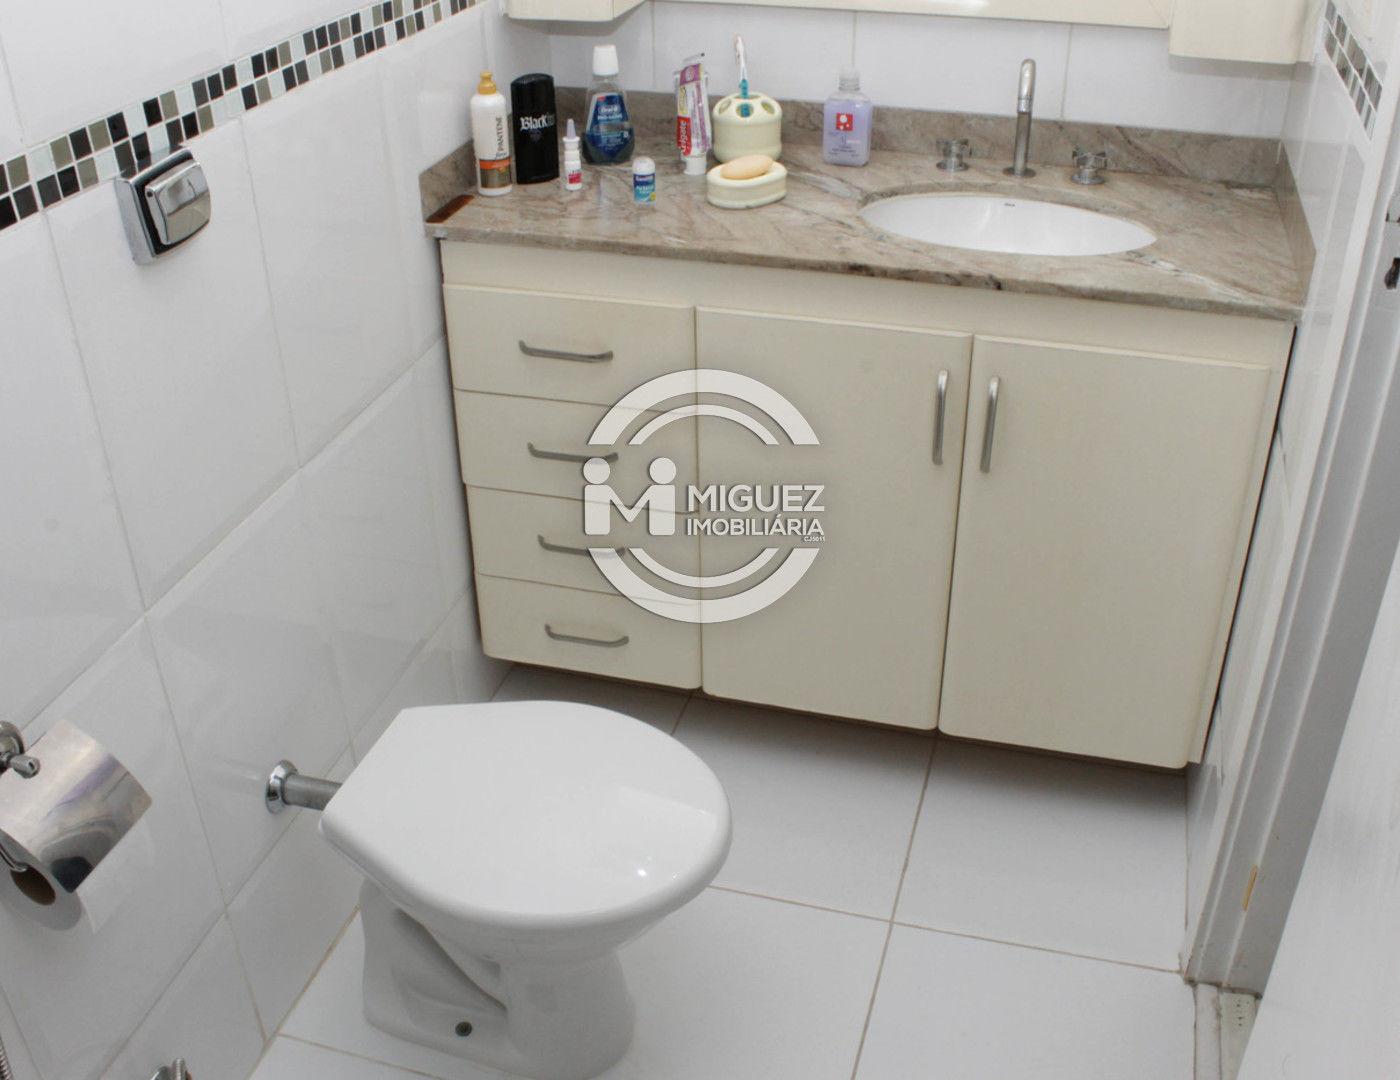 Apartamento, venda, Rua General Espírito Santo Cardoso - Tijuca , Rio de janeiro